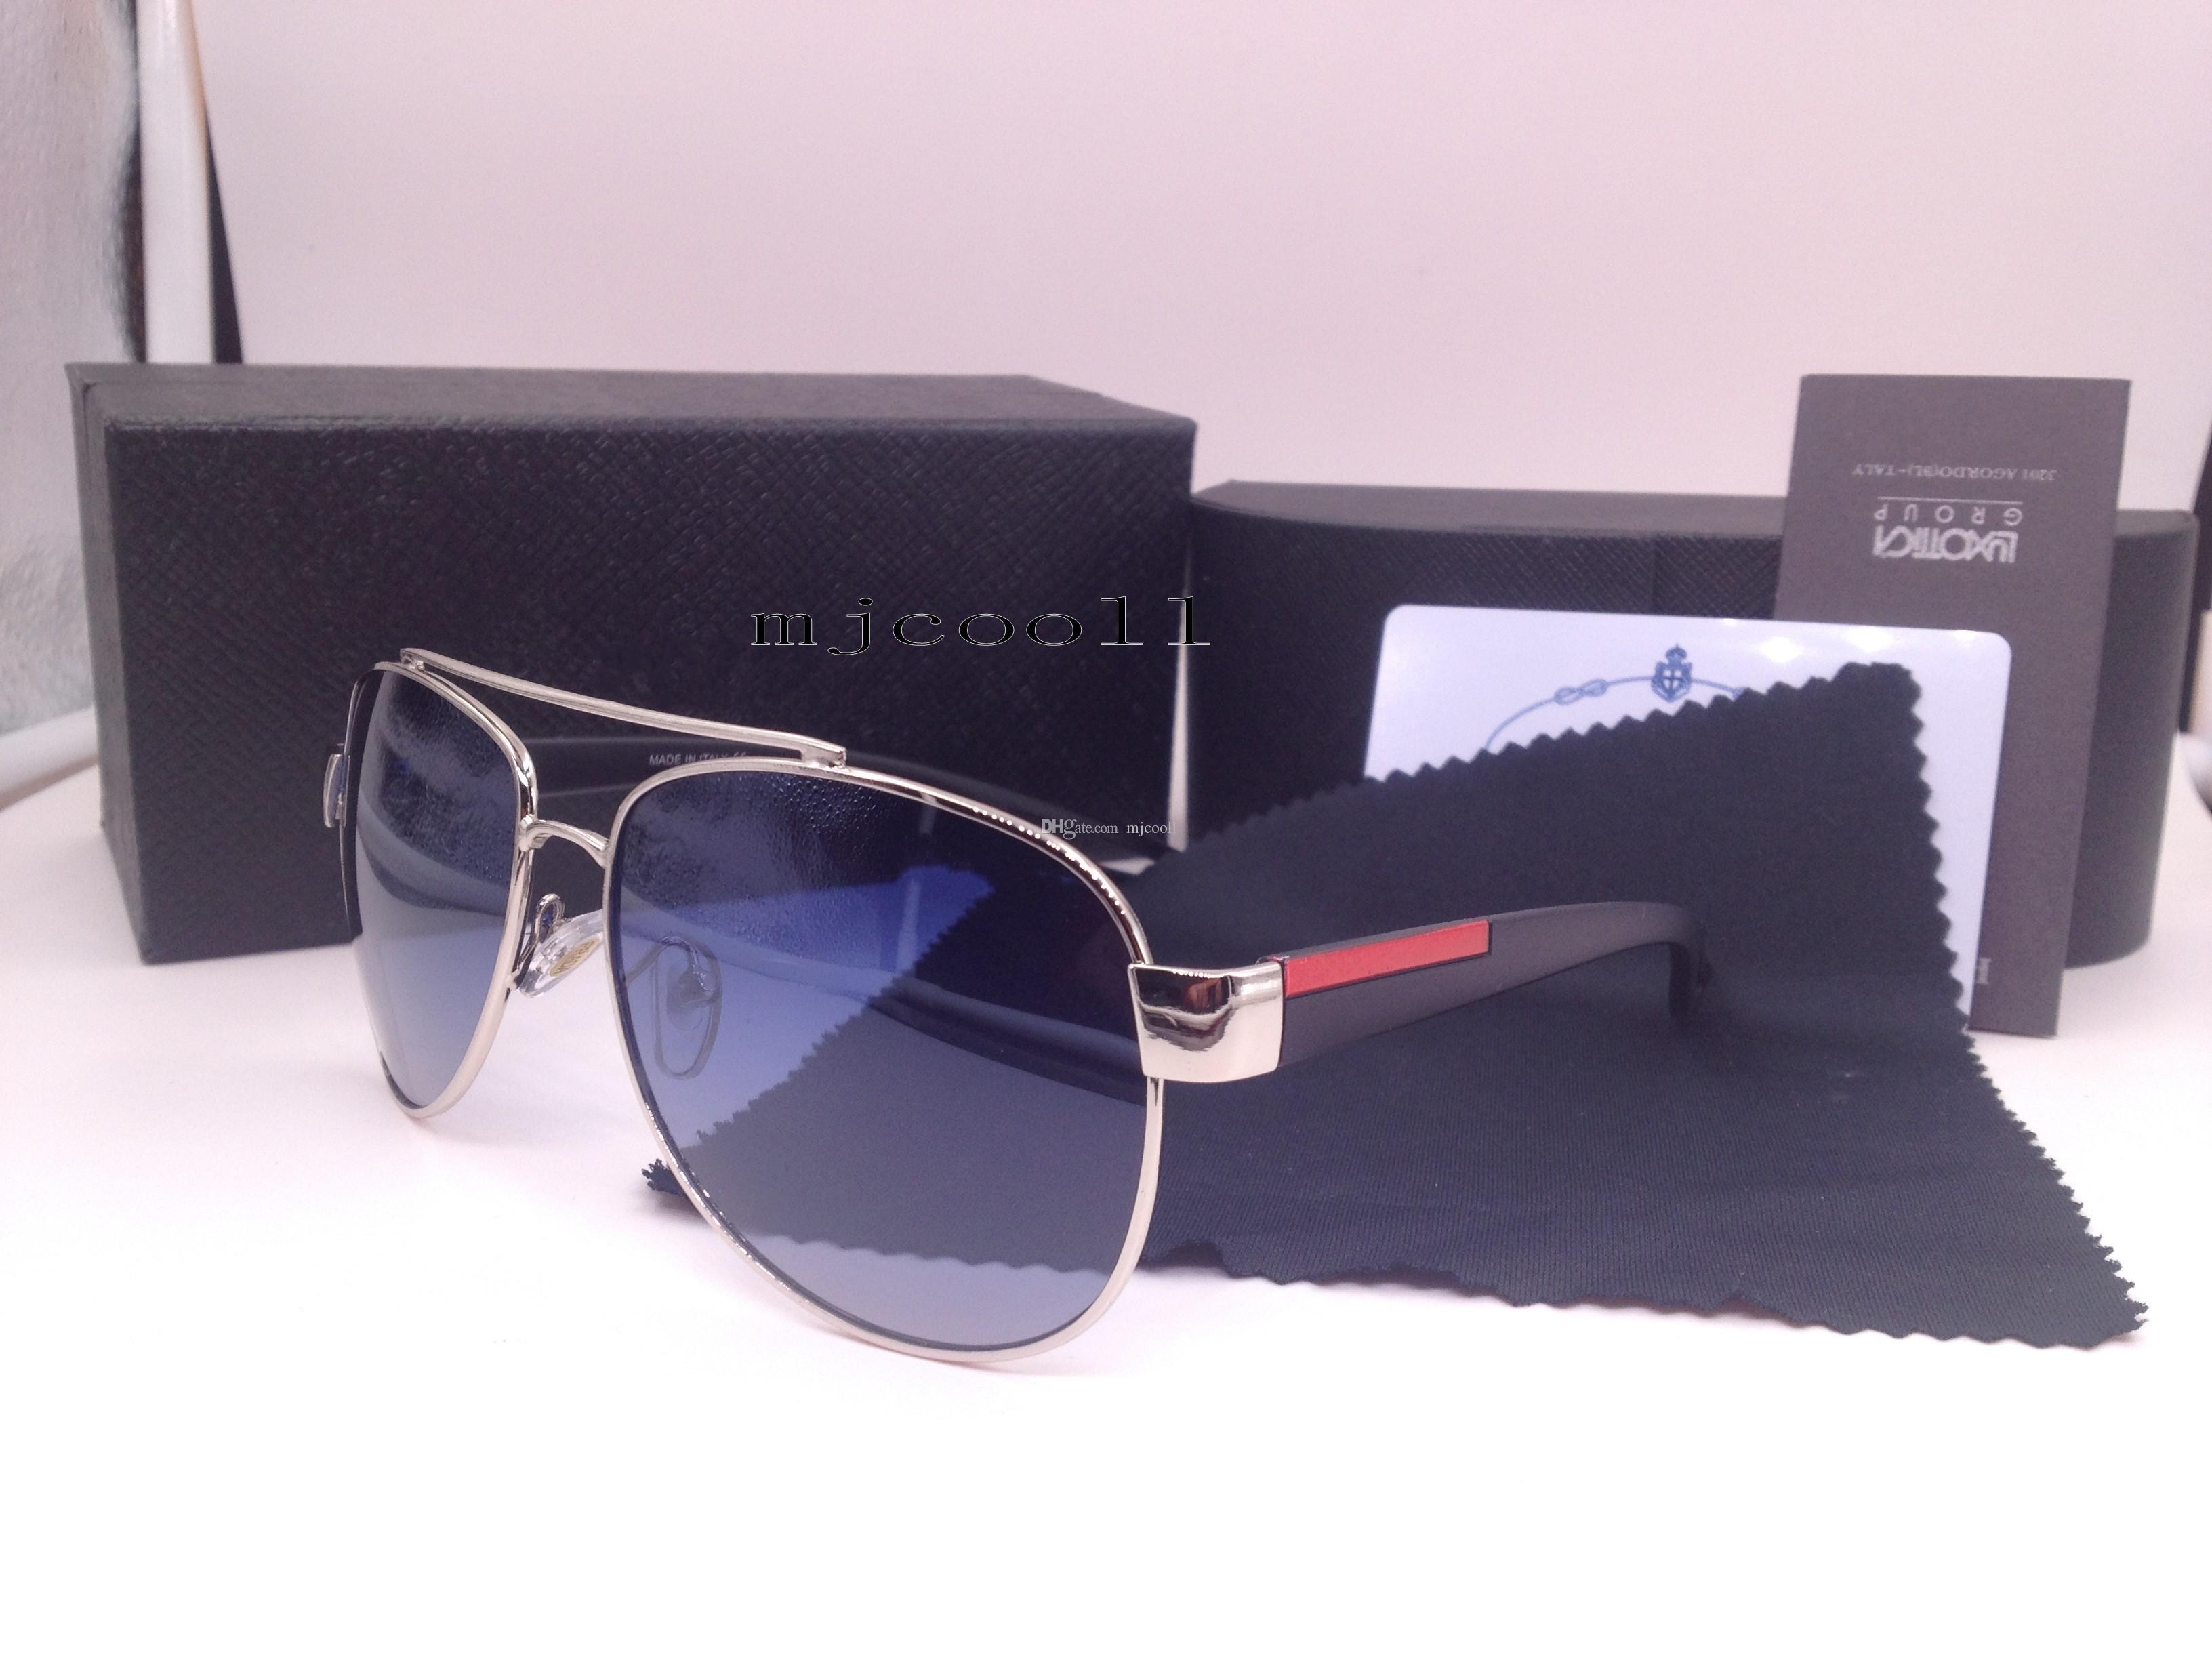 3f88dbaf35 Compre Gafas De Sol De Moda De Calidad Superior 2018 Nuevos Hombres Gafas  De Sol P550s Con La Caja Original A $16.25 Del Mjcooll | DHgate.Com